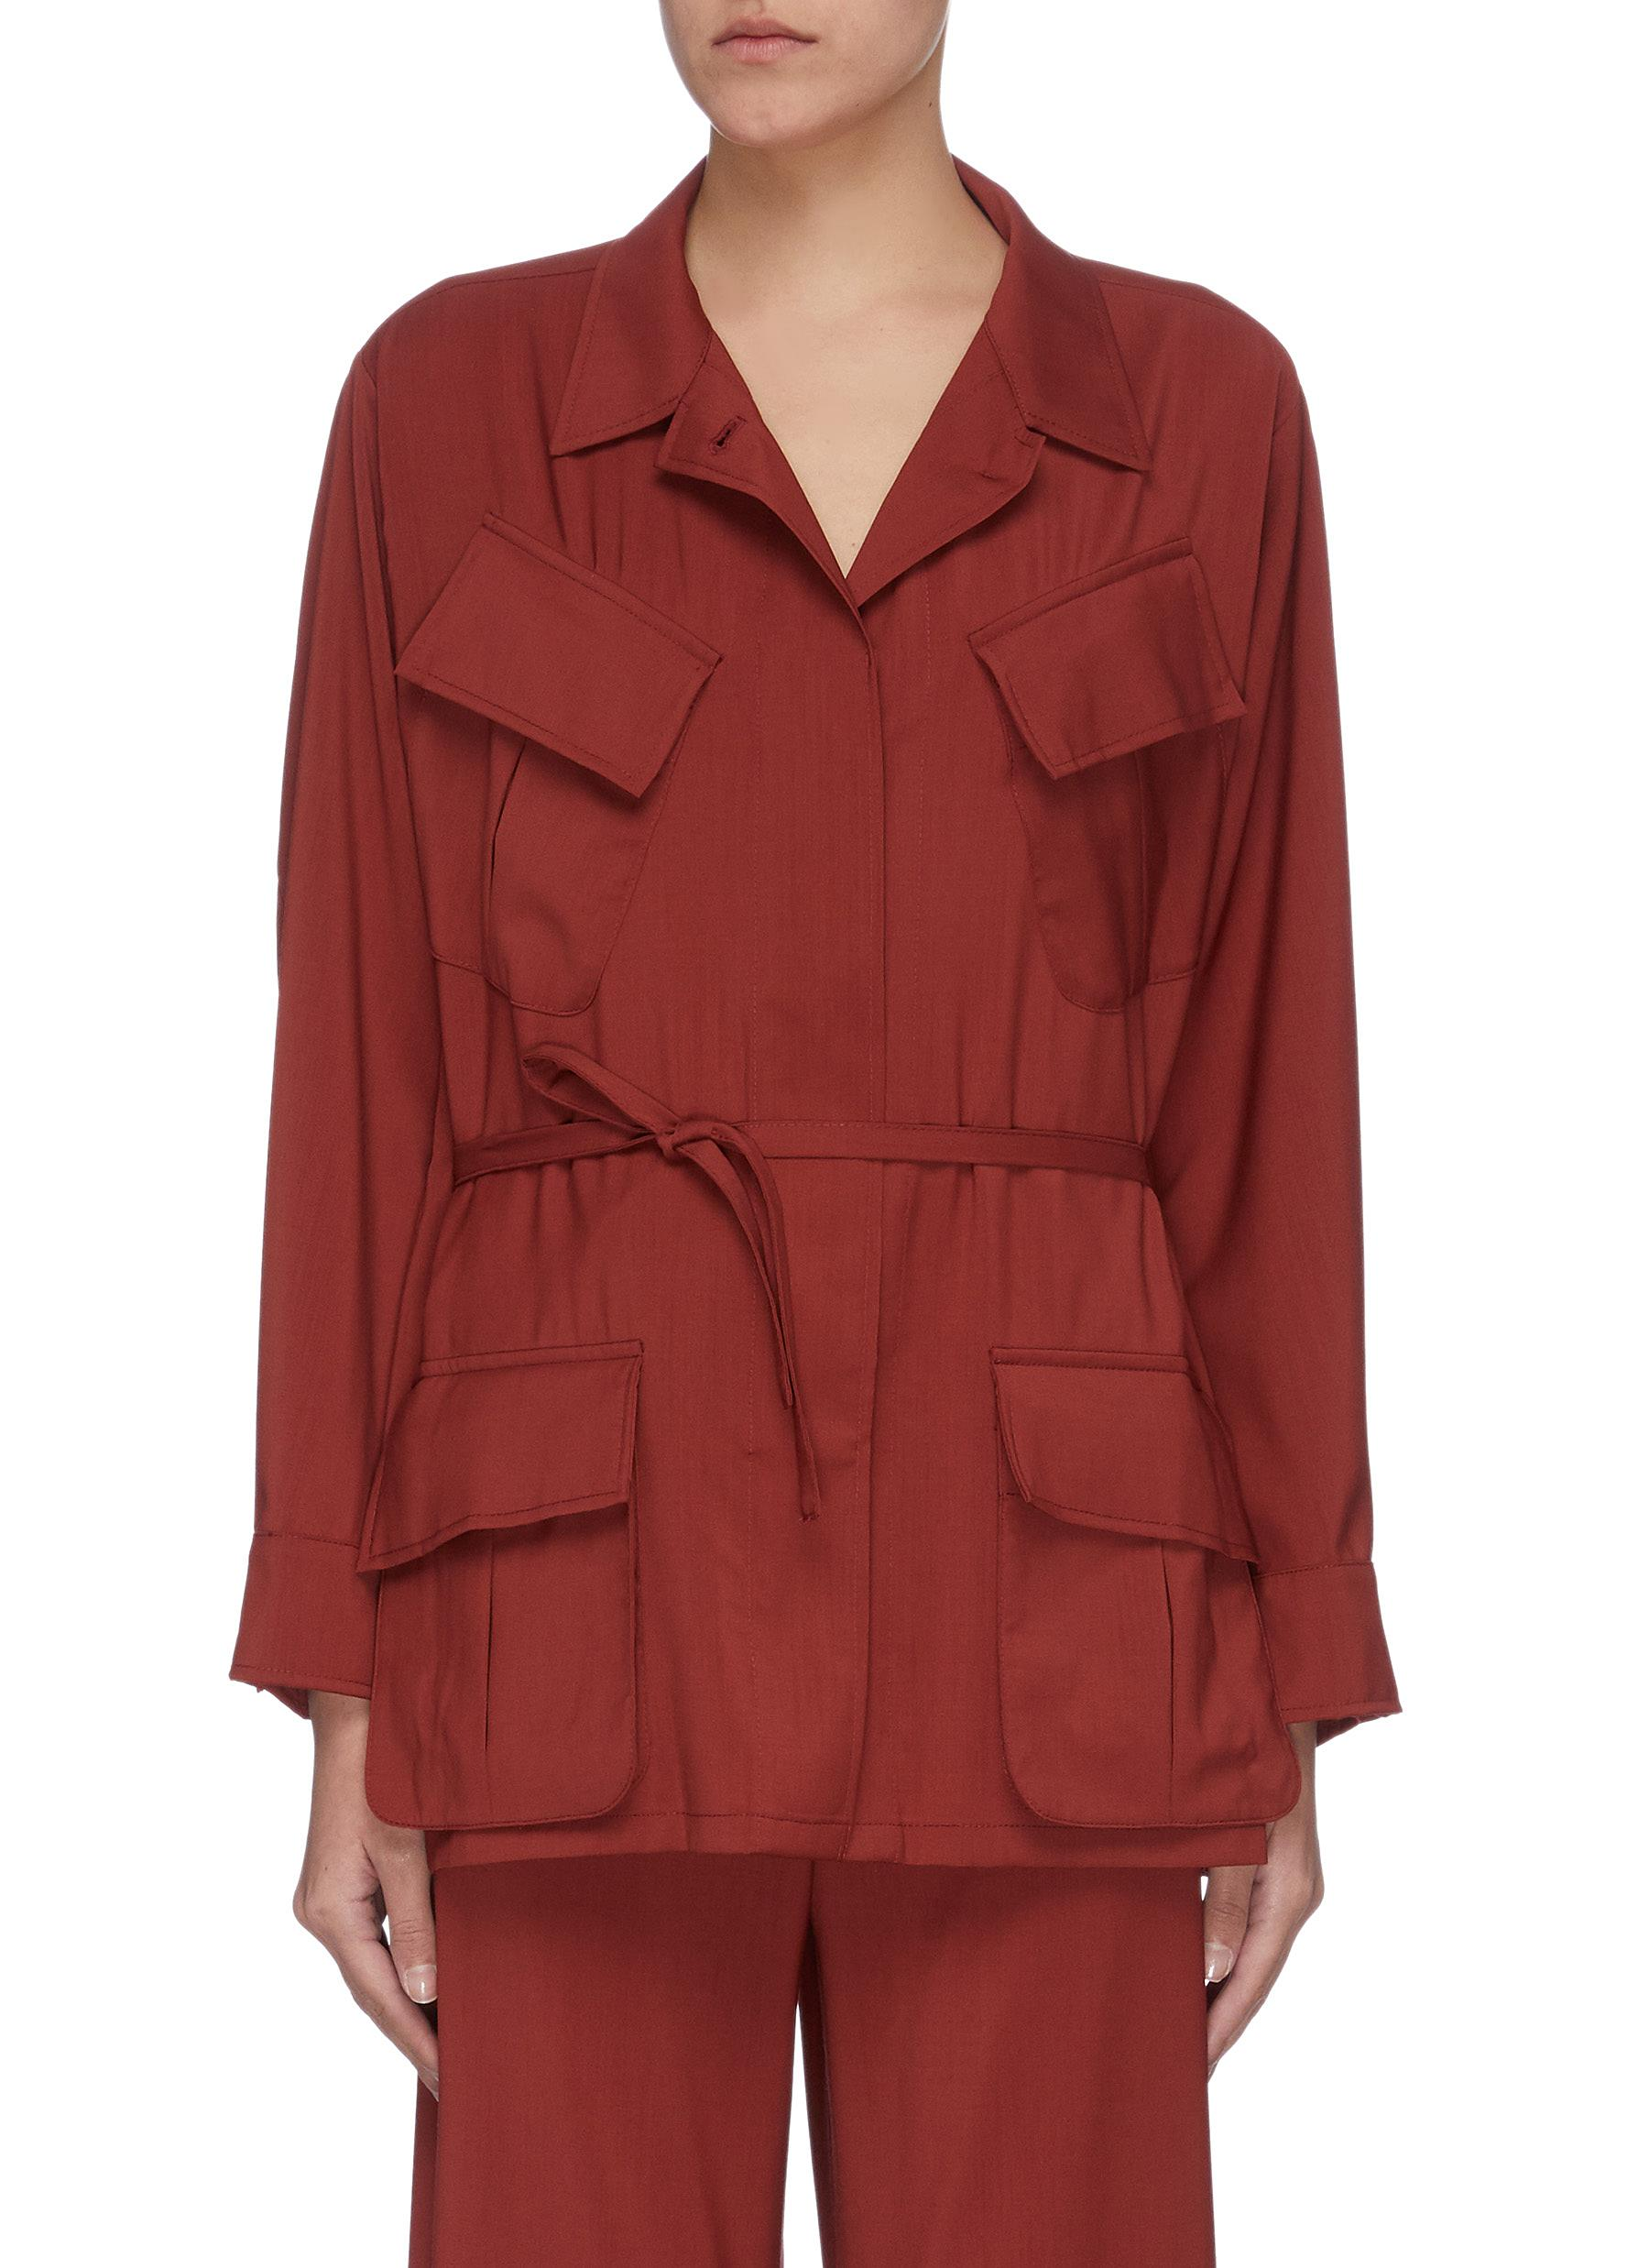 Buy Barena Jackets 'Vanna' slanted pocket virgin wool cargo jacket